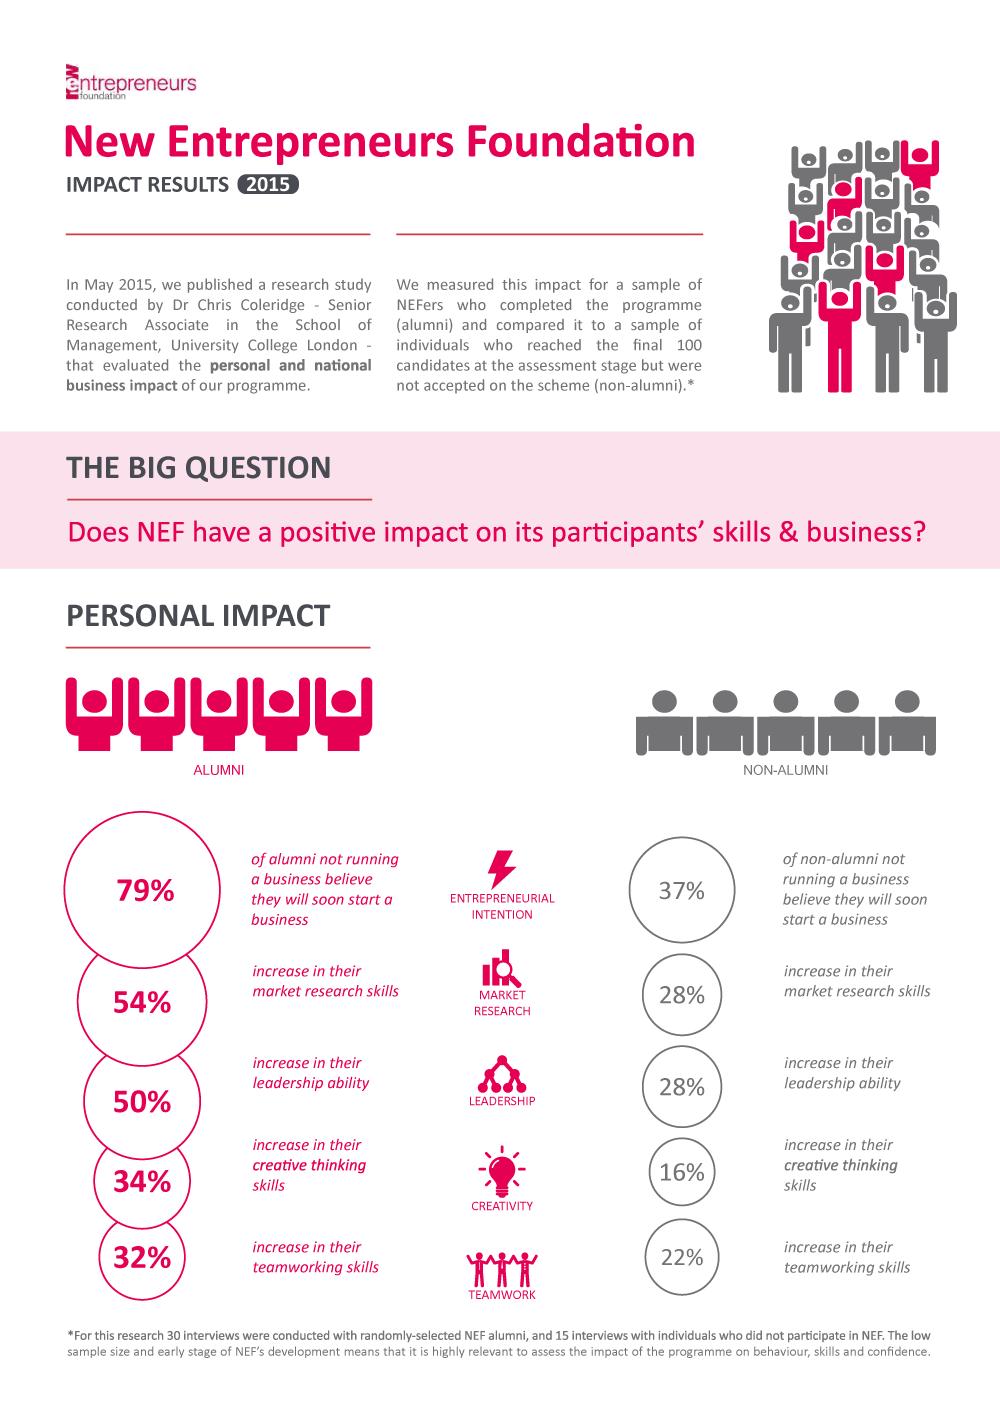 New Entrepreneurs Foundation Impact Results 2015